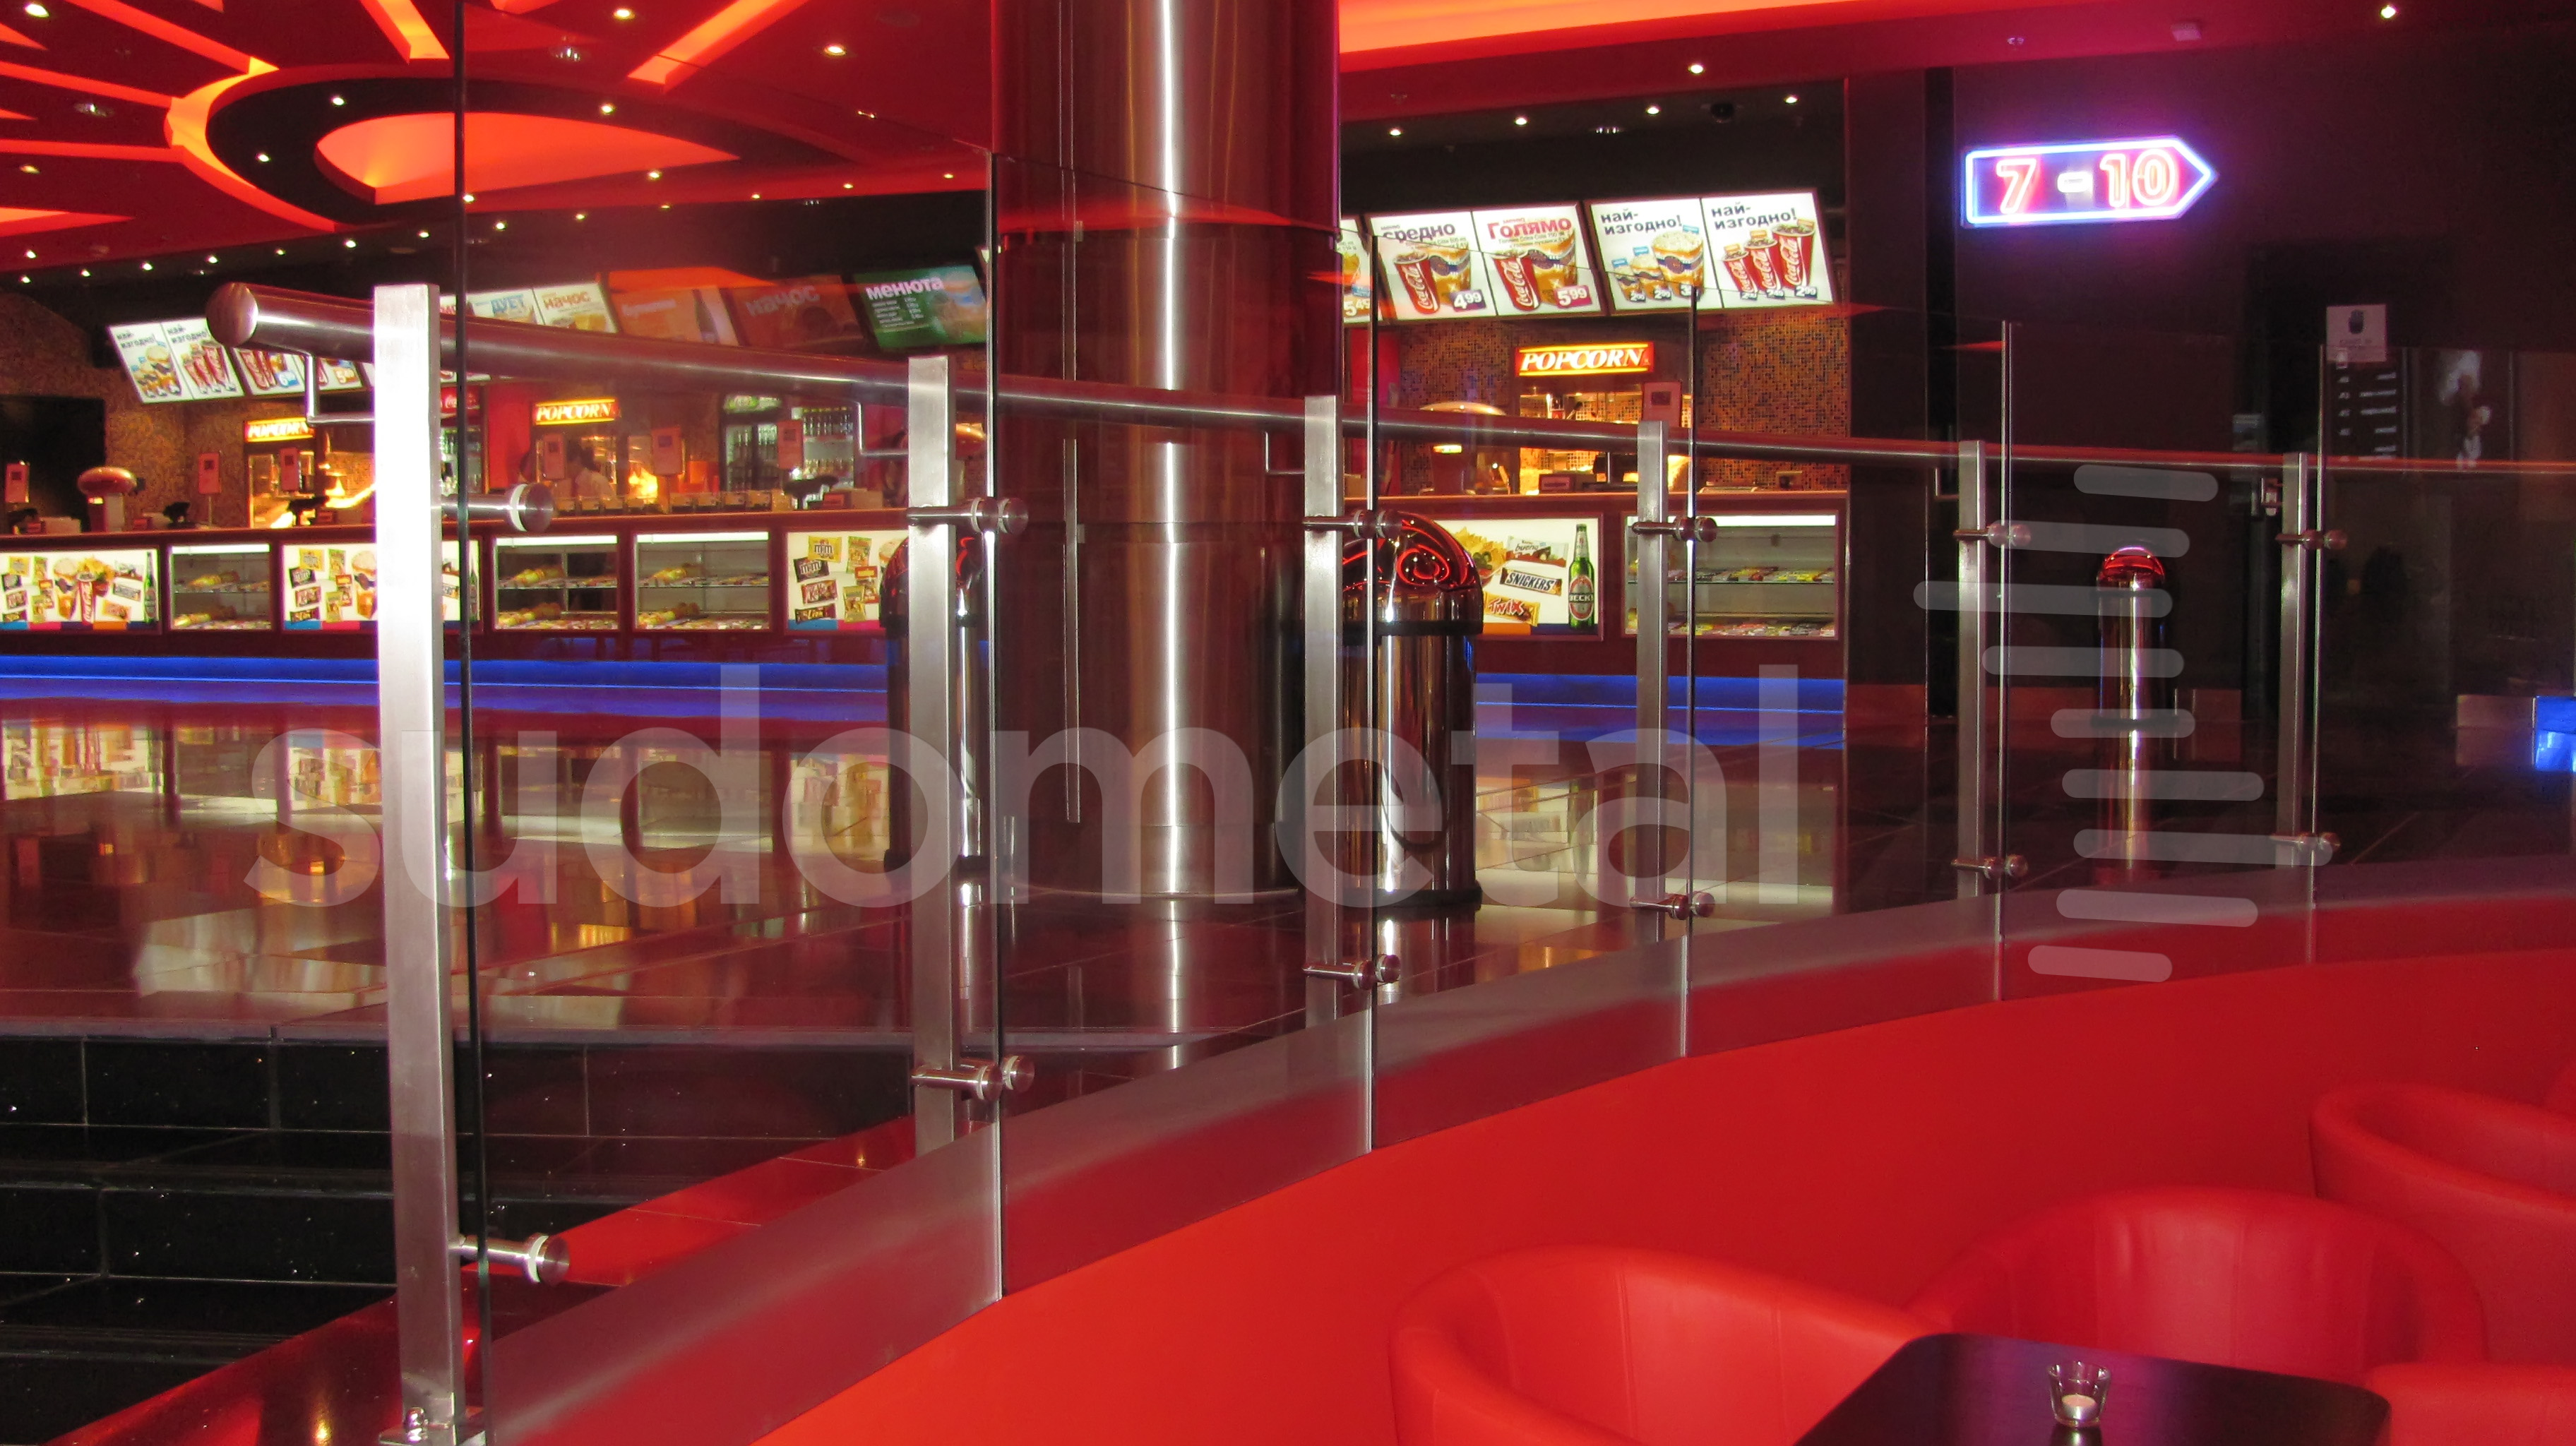 Balustrade exterioare - Balustrade Mall Ruse Bulgaria SUDOMETAL - Poza 2